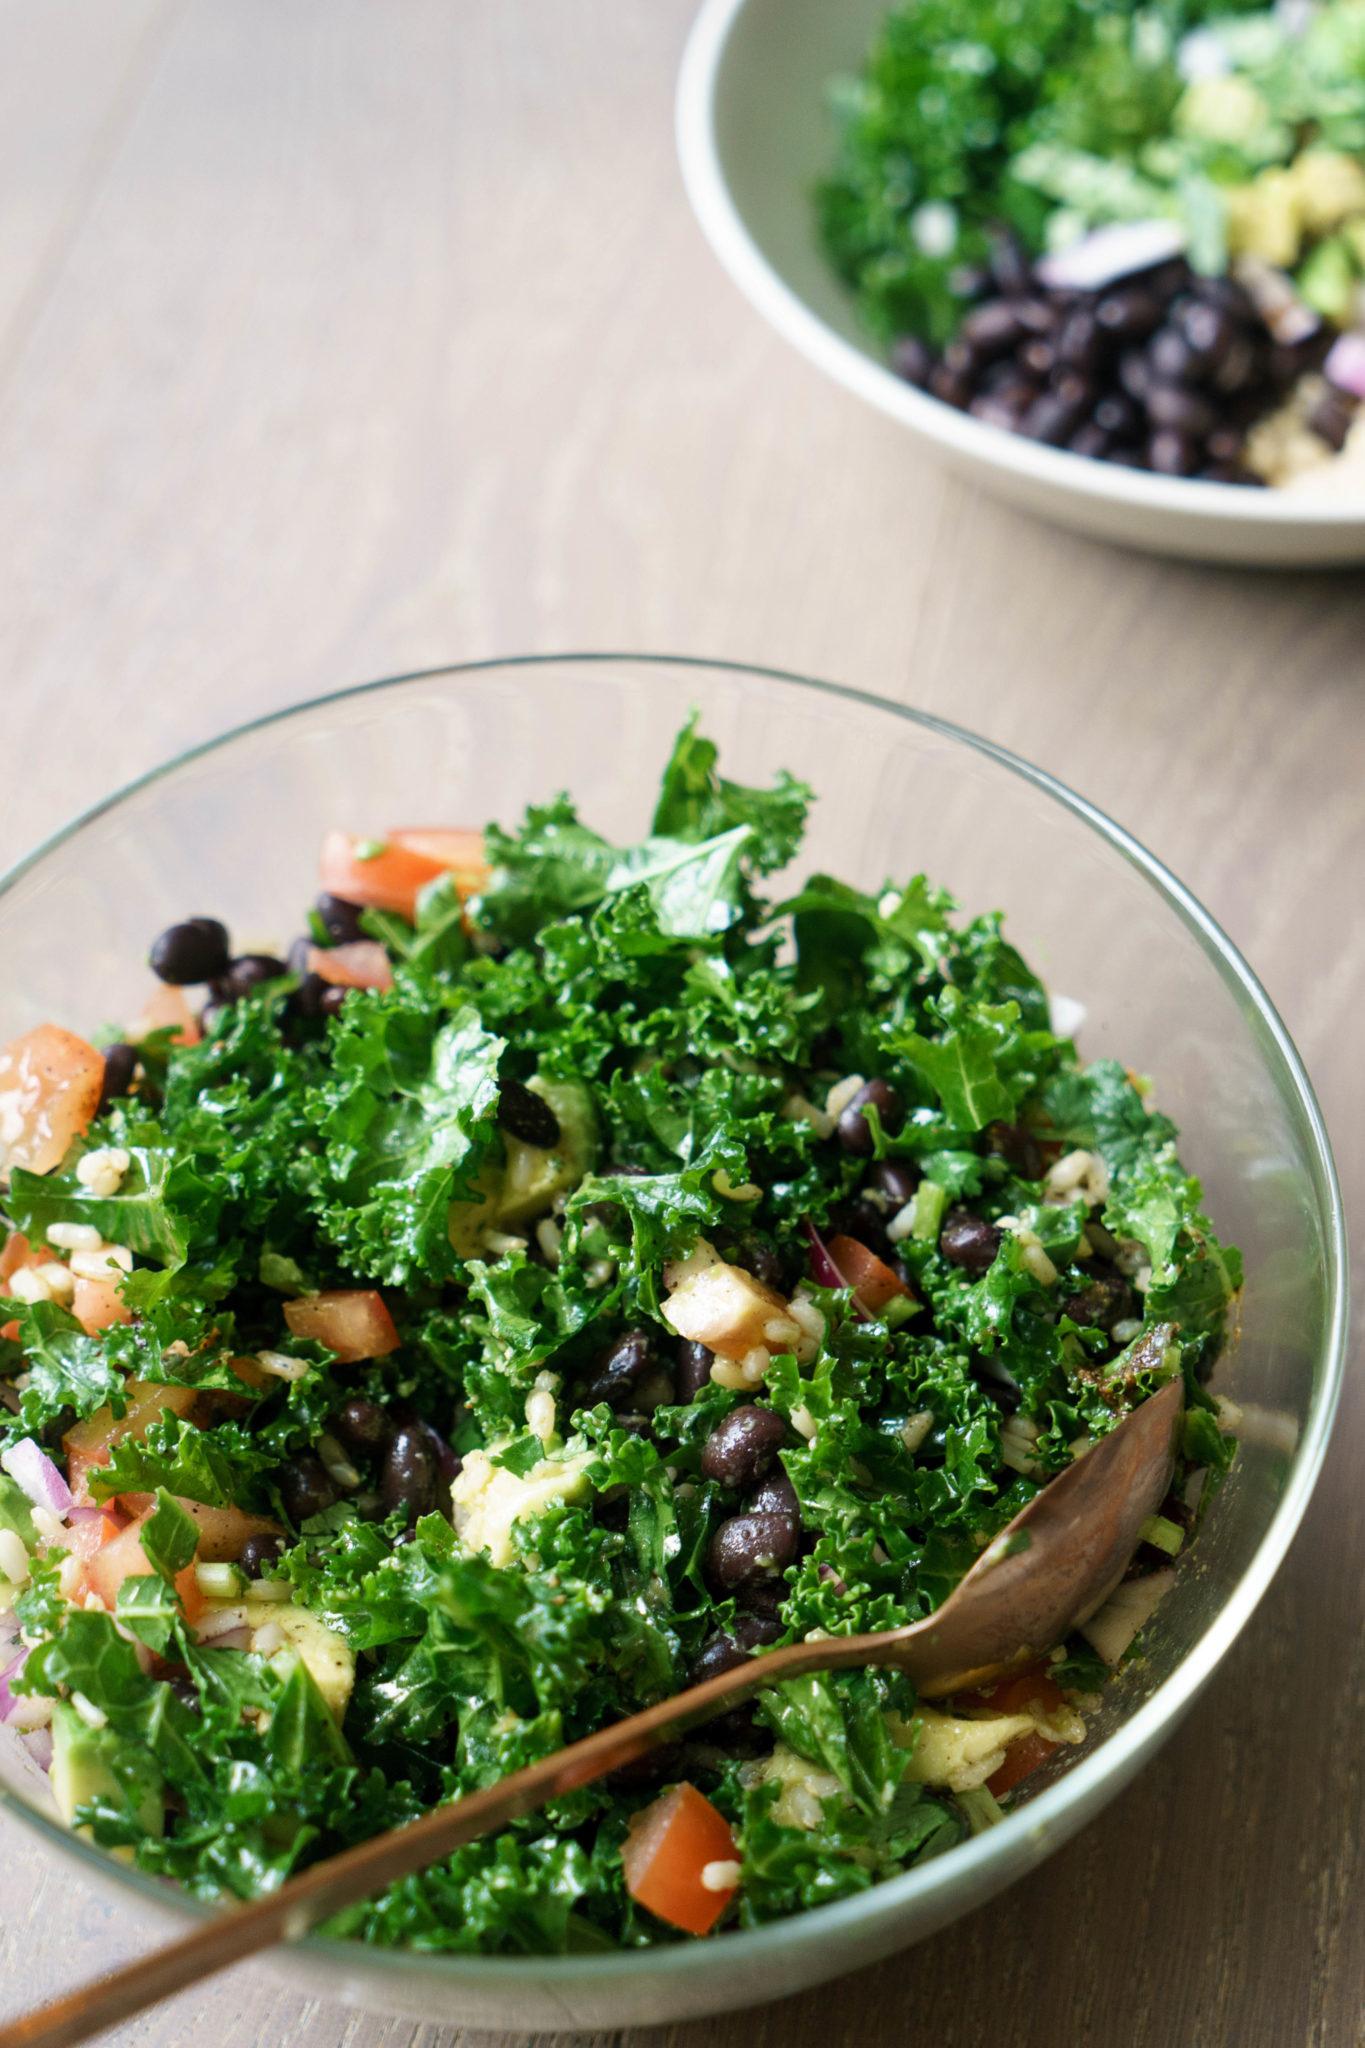 Brown Rice, Kale and Bean Salad